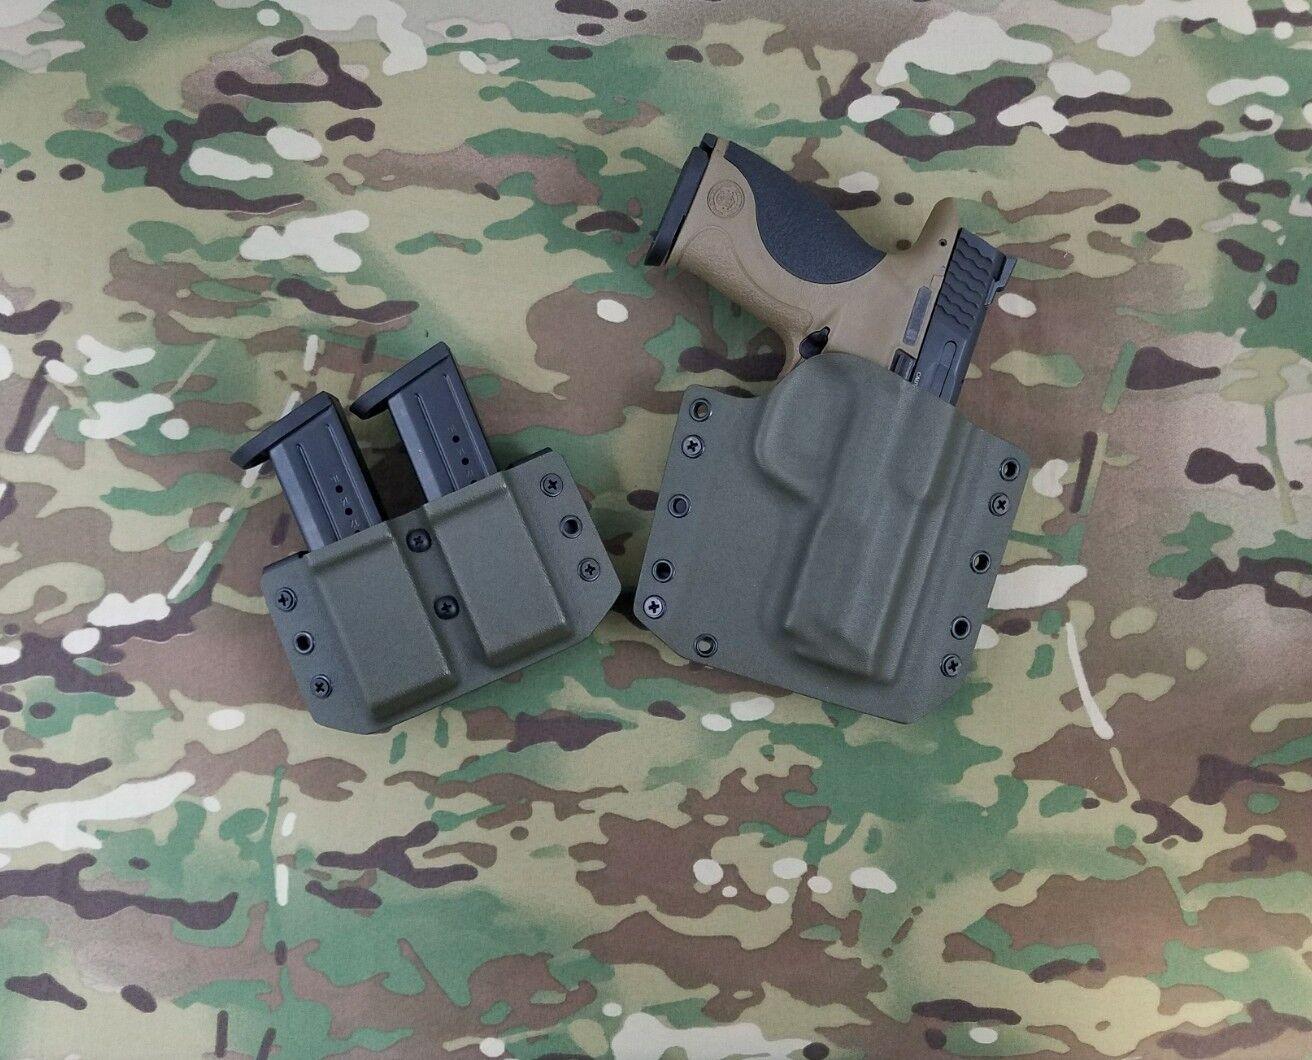 Smith&Wesson M&P Full Größe 9/40 Kydex Kydex 9/40 Holster & Double Mag Pouch OWB OD Grün 749d1c